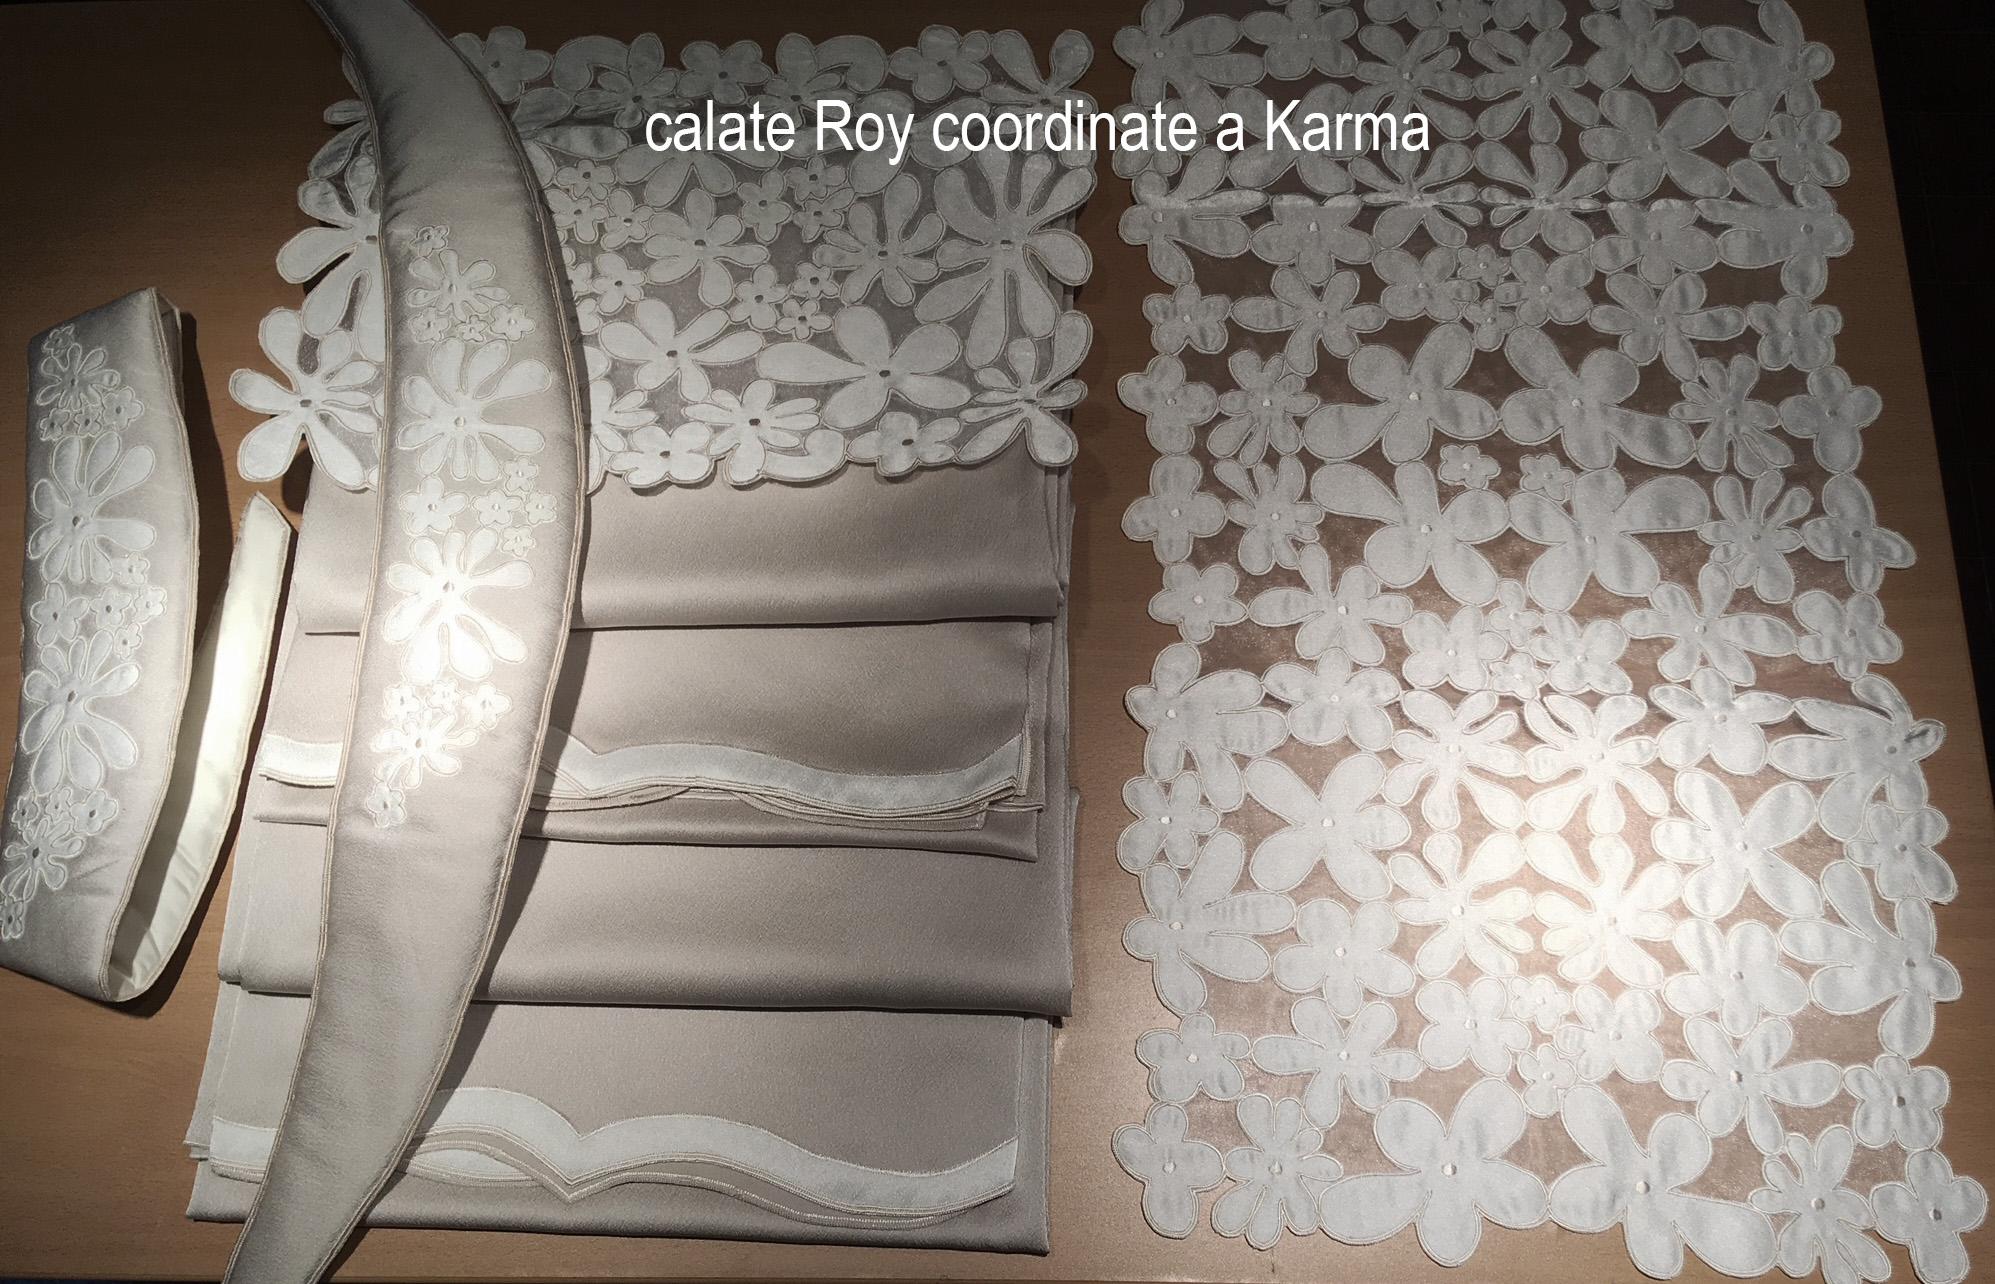 03 calate Roy coordinate a Karma